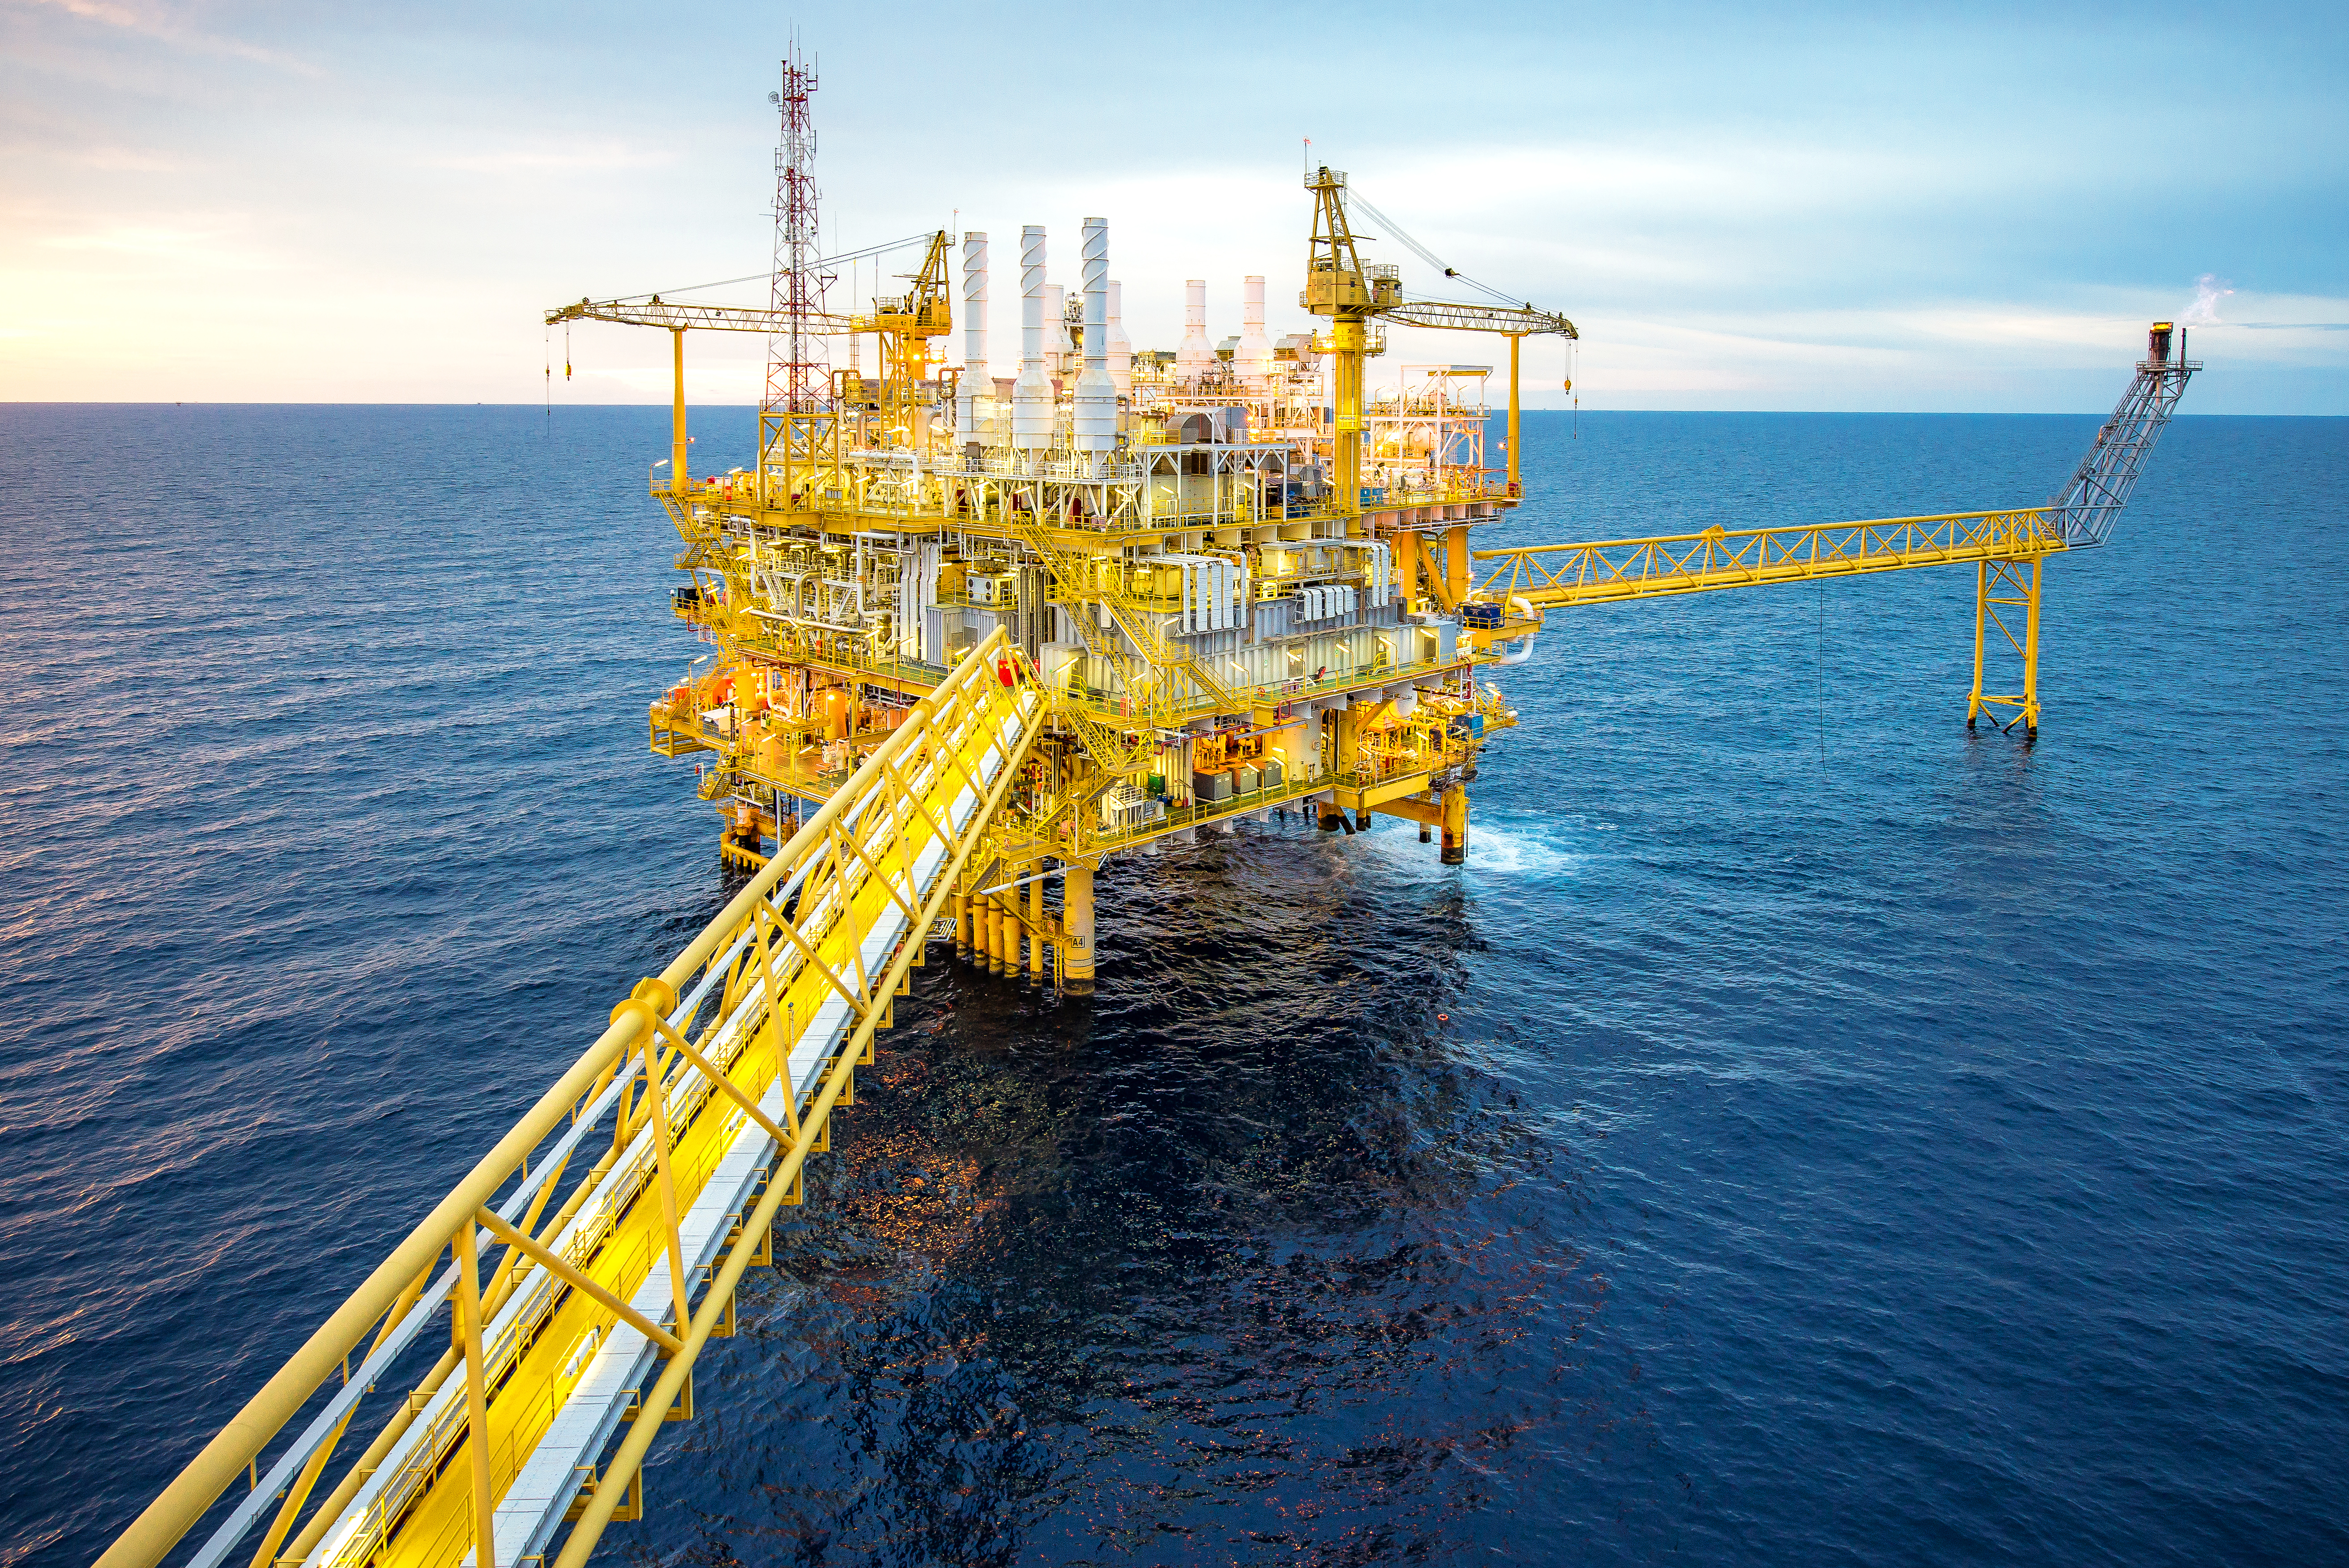 Oregon Offshore Drilling. Shutterstock